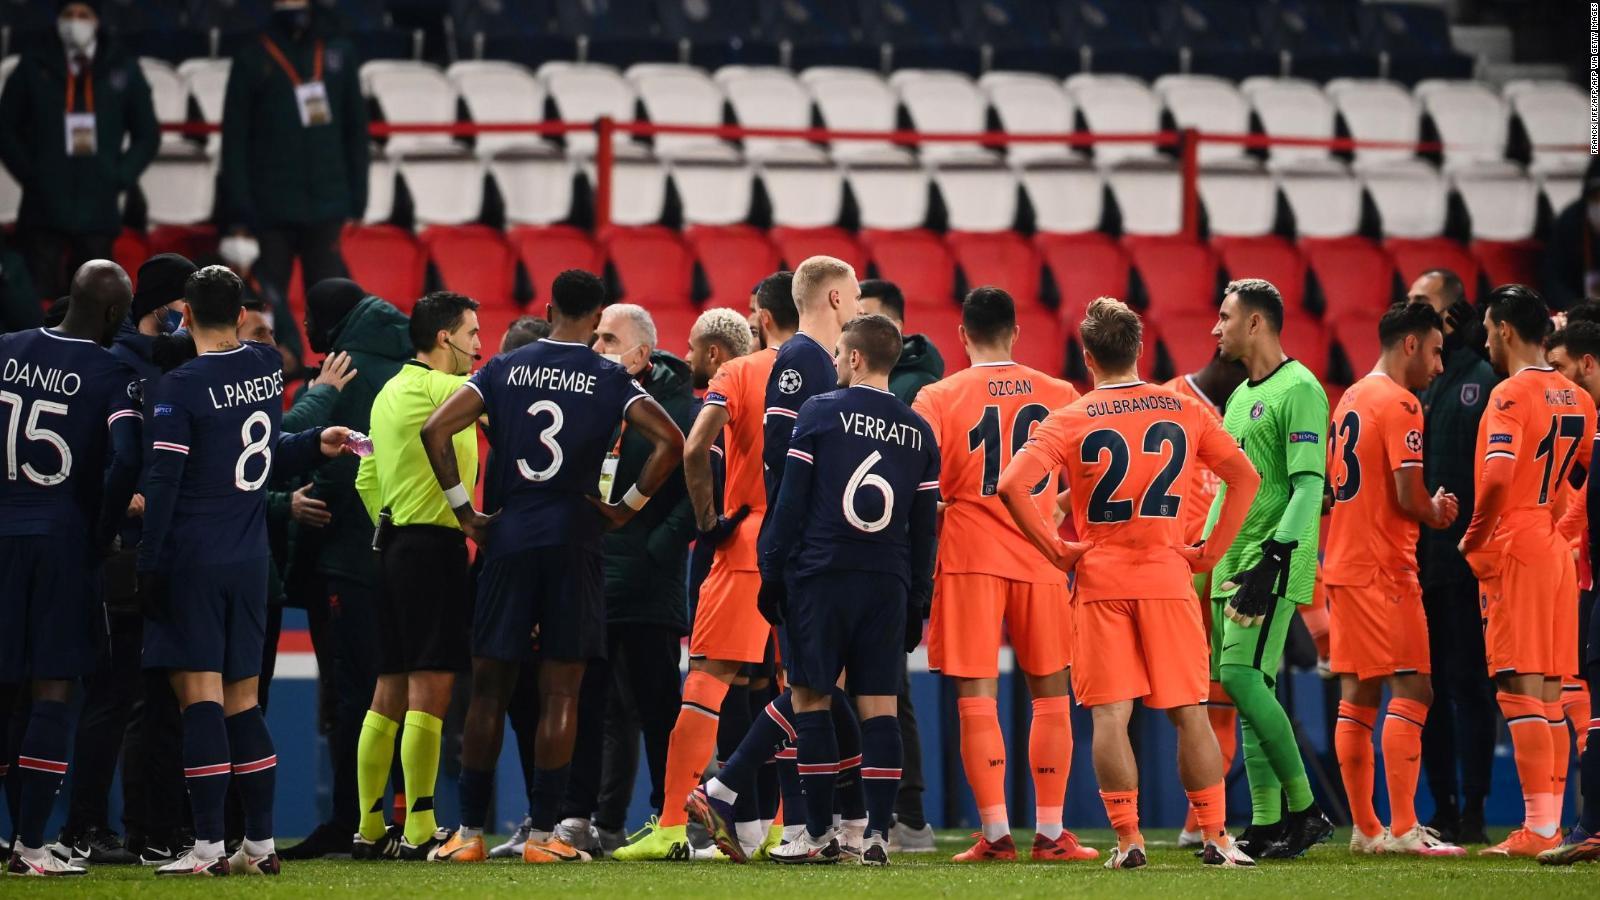 psg vs istanbul basaksehir teams walk off pitch following alleged racist incident